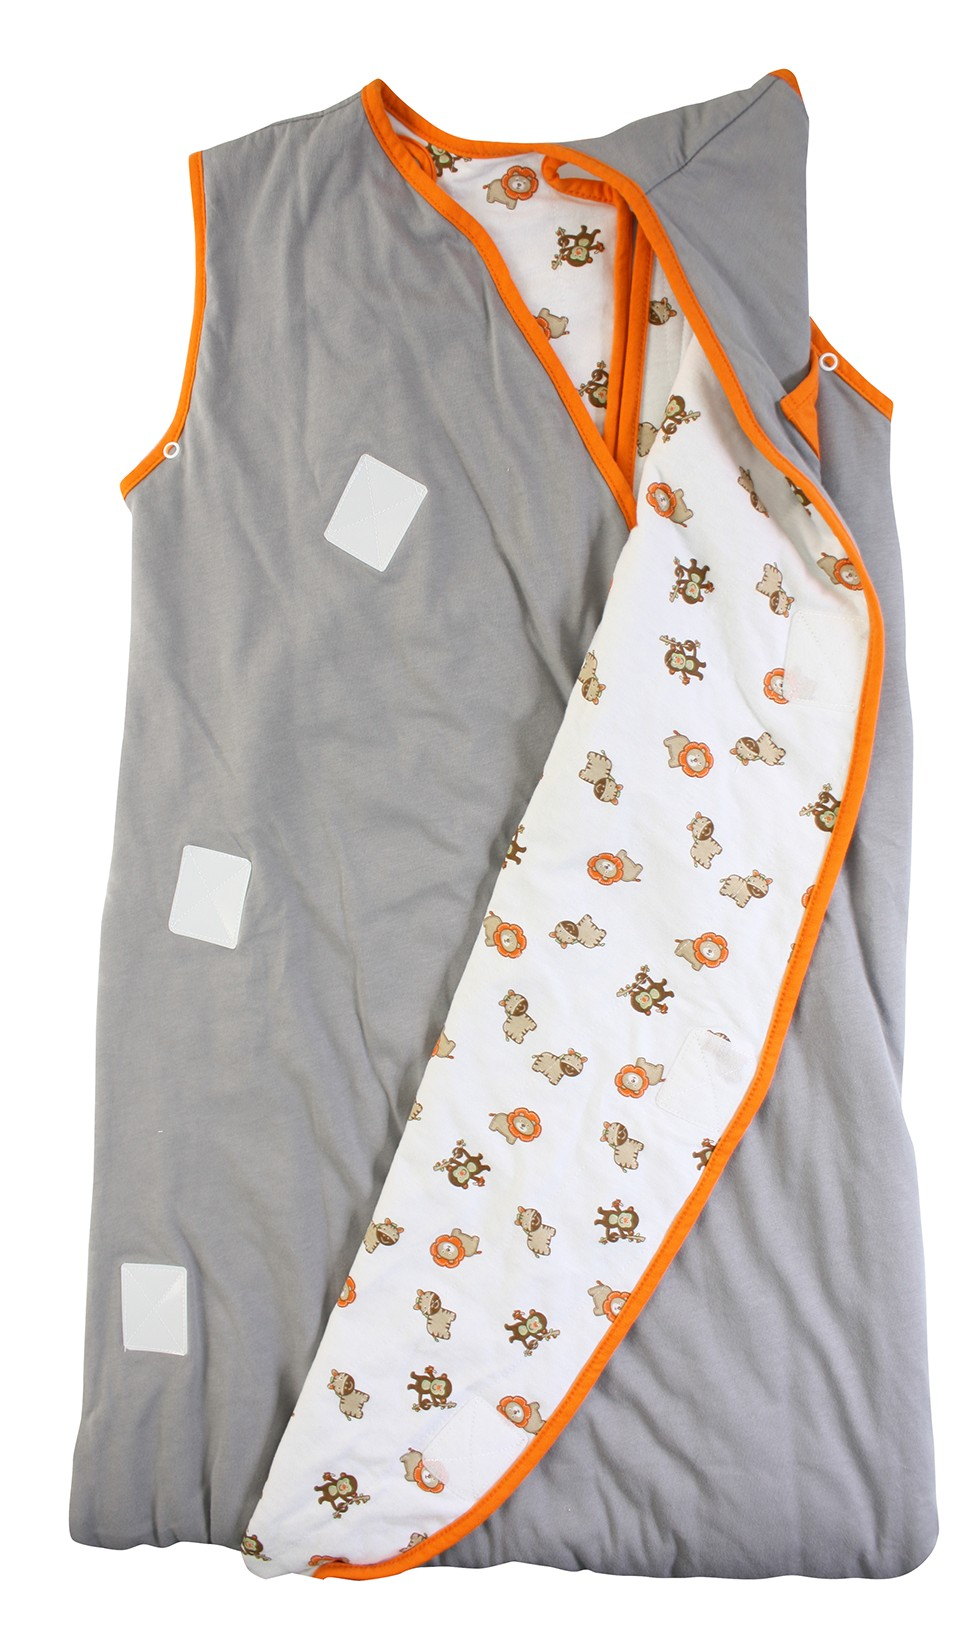 Sac de dormit multifunctional Grey Orange Zoo Animal Travel 1-3 ani 2.5 Tog